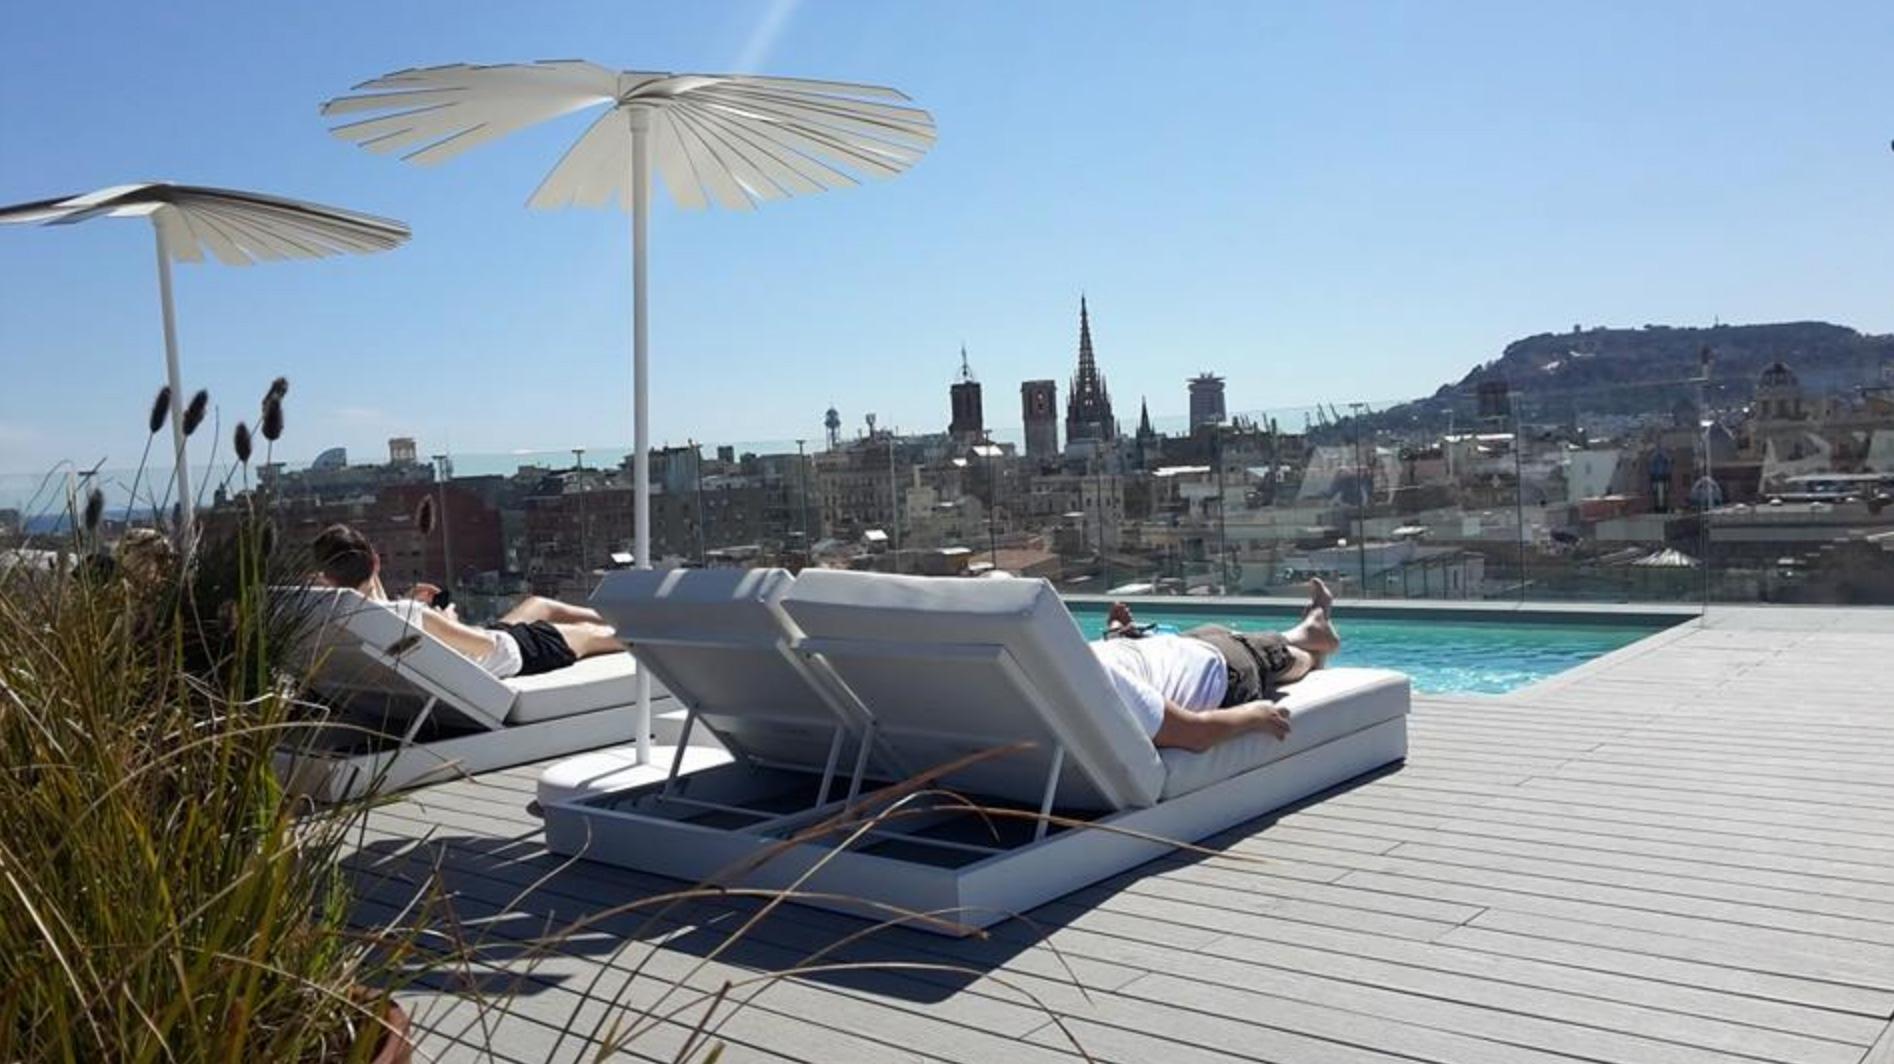 Terrazas de vacaciones en barcelona for Terrazas de hoteles en barcelona